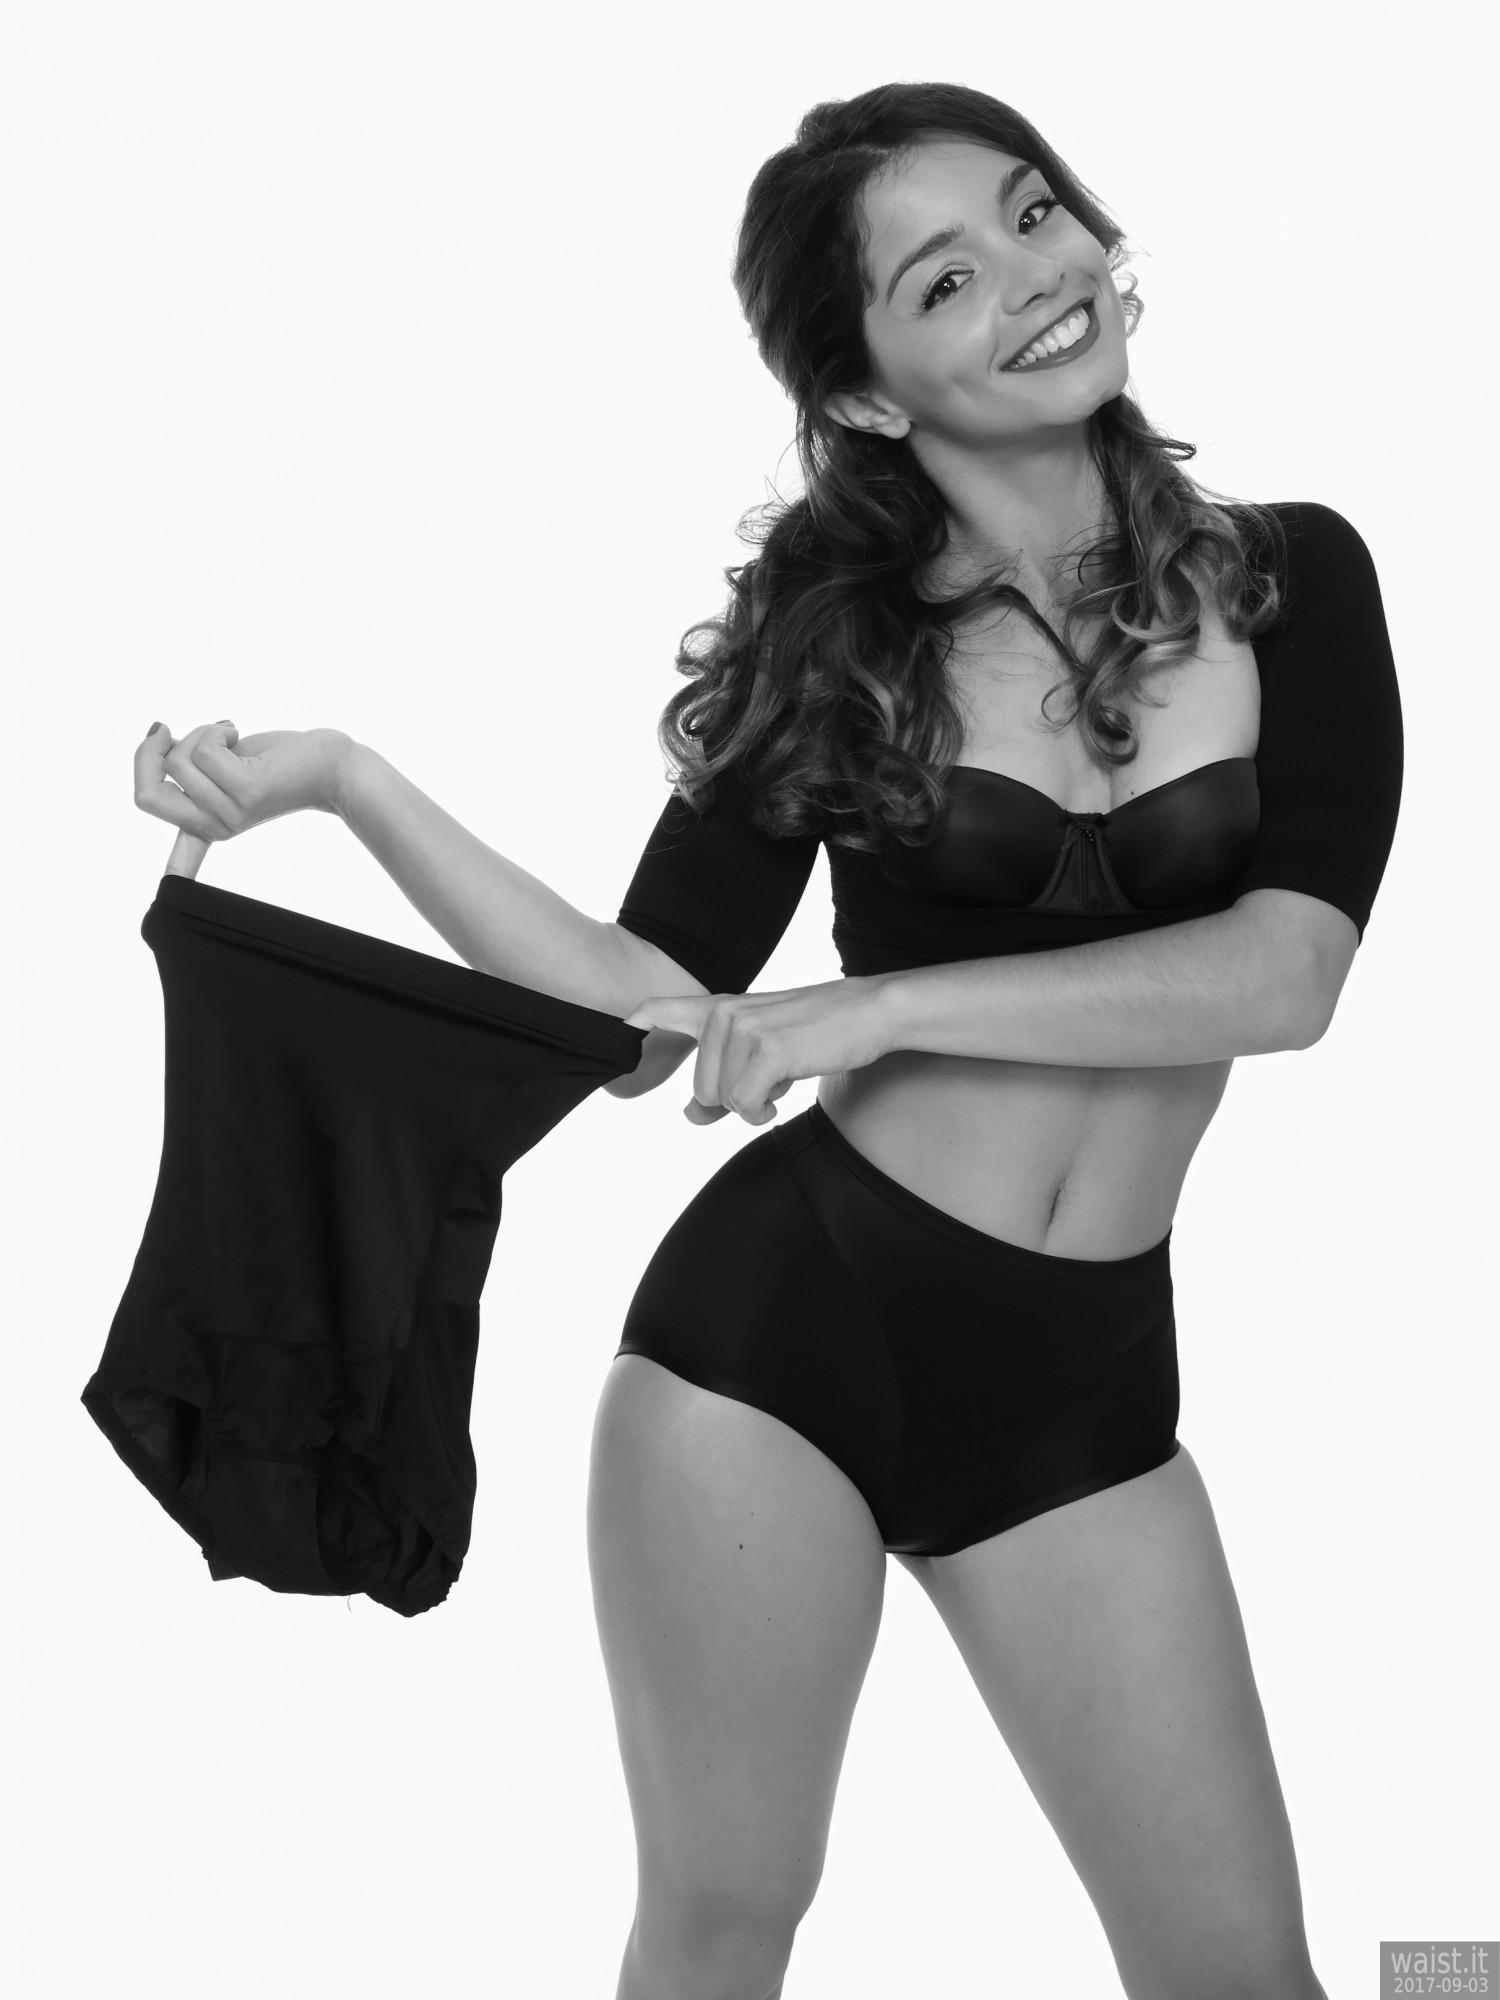 2017-09-03 Kris in black bra, posture top and control briefs worn as hotpants